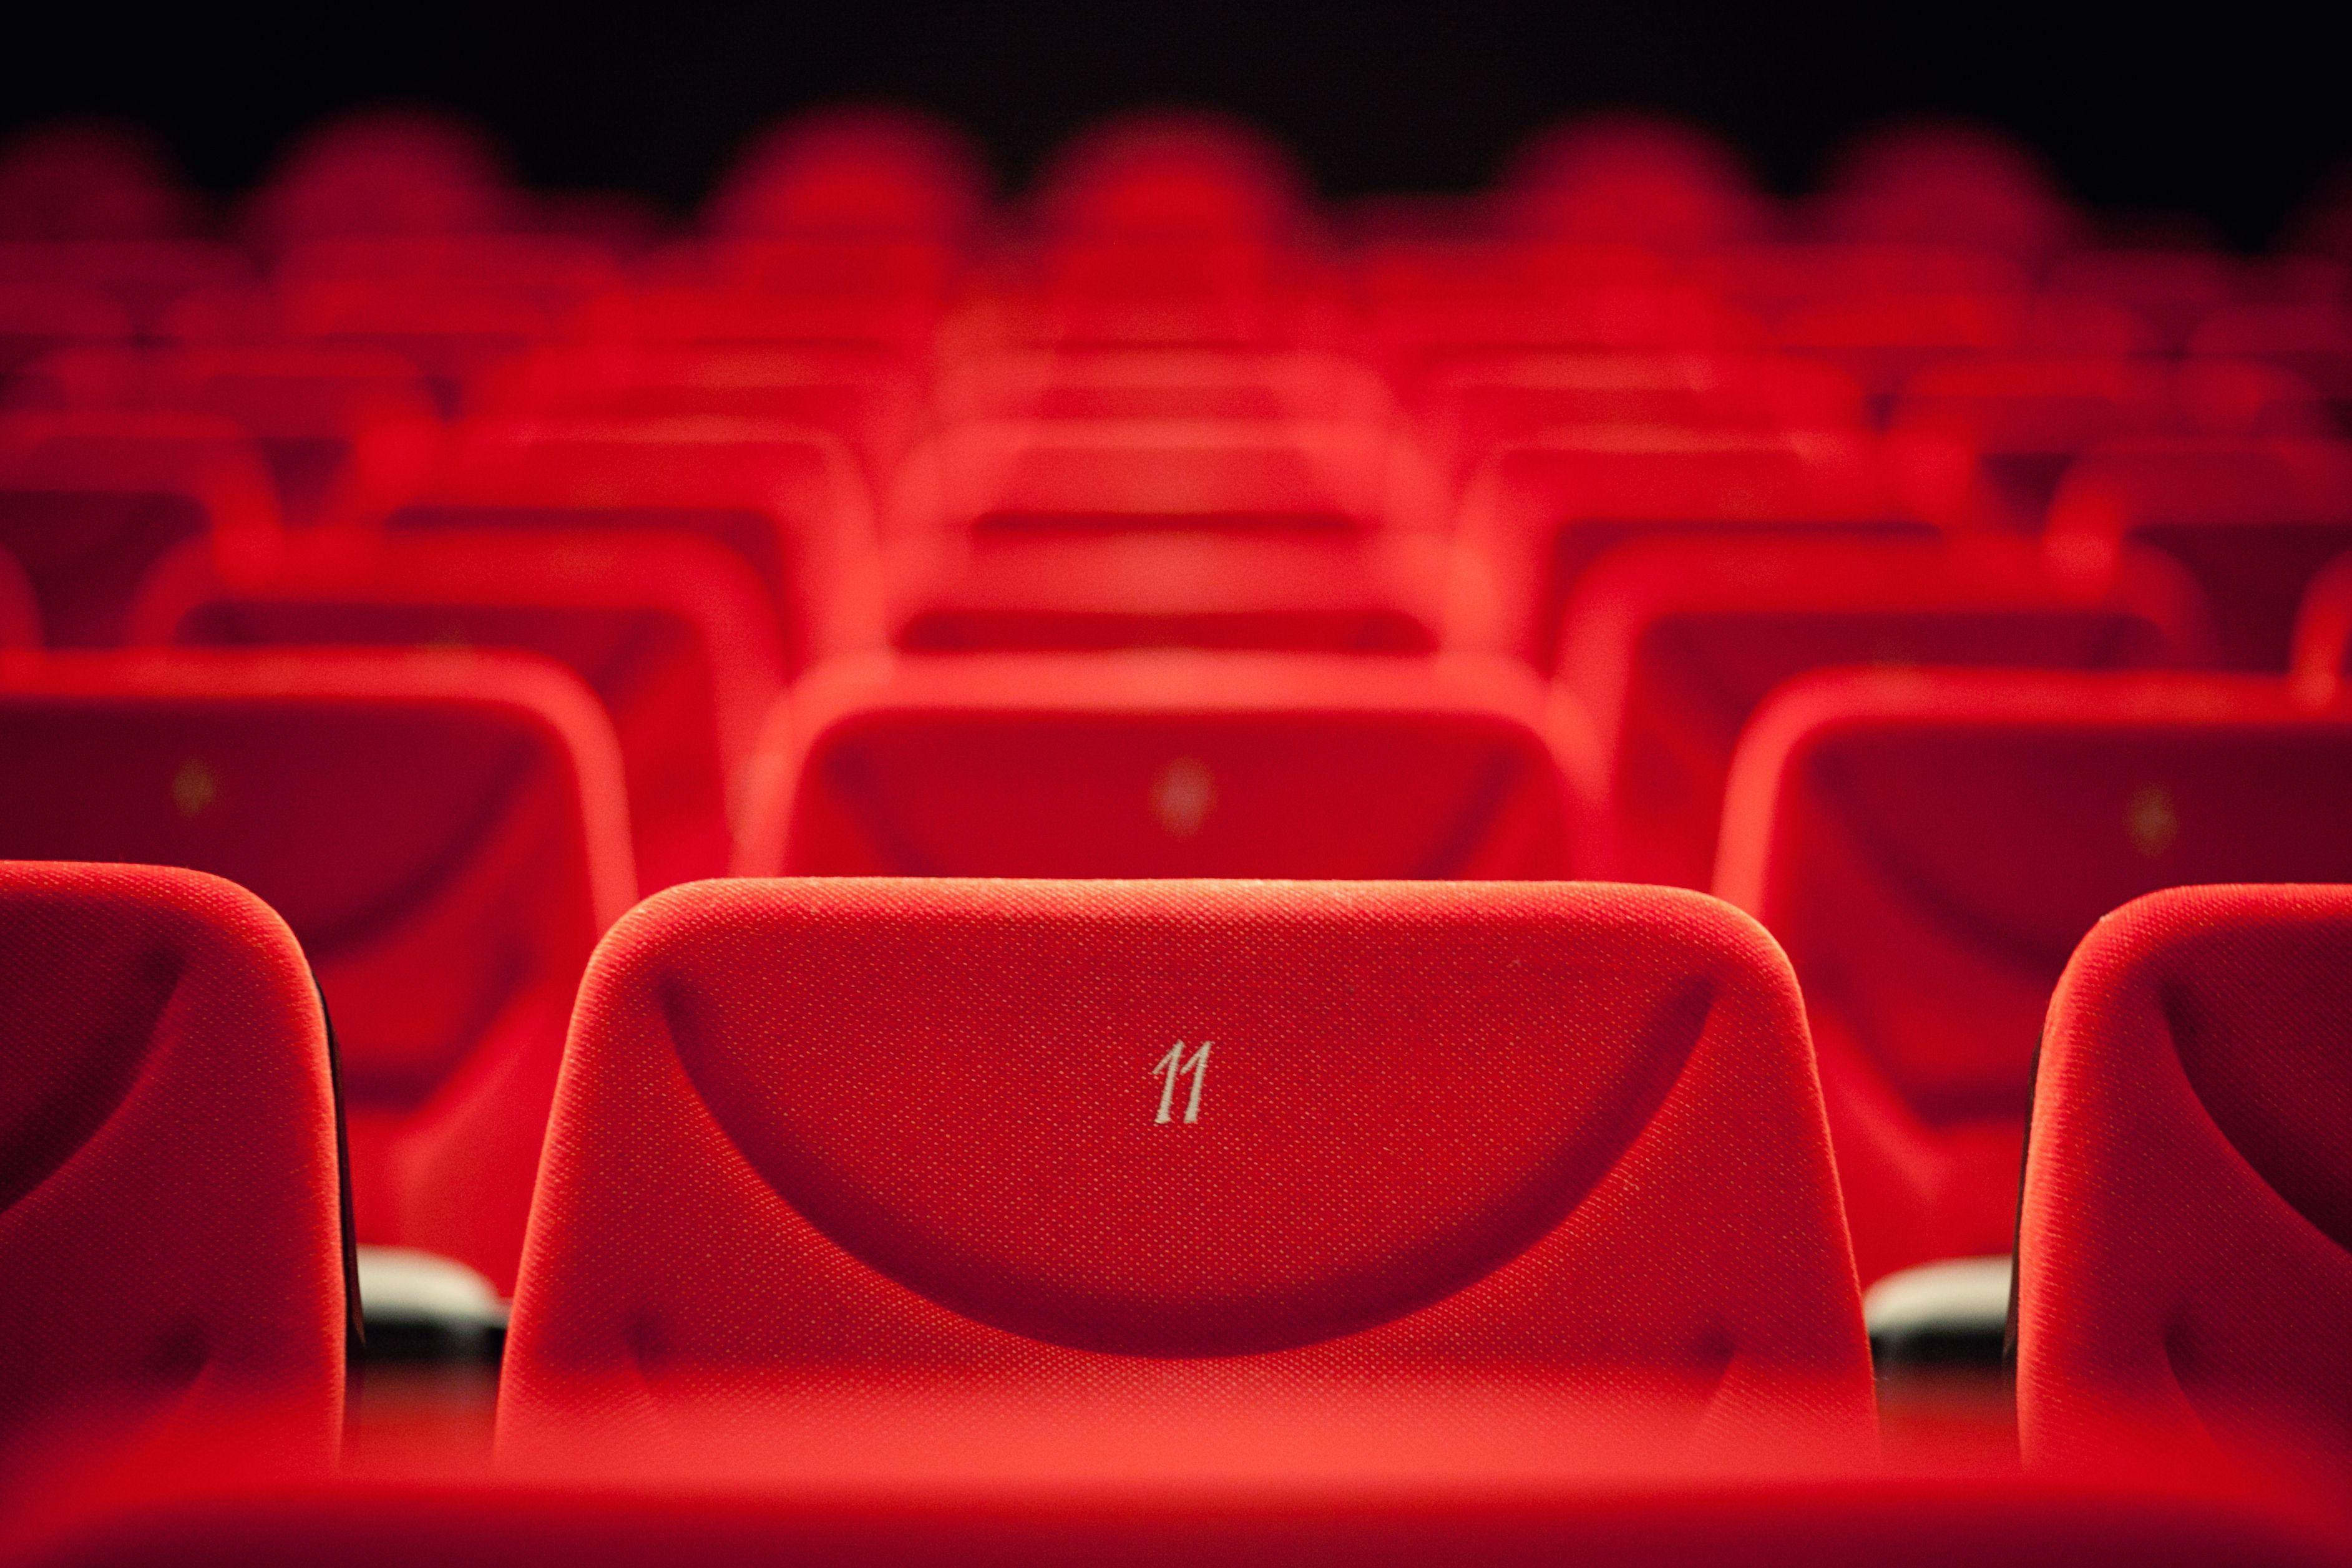 Cinema Hd Wallpapers Top Free Cinema Hd Backgrounds